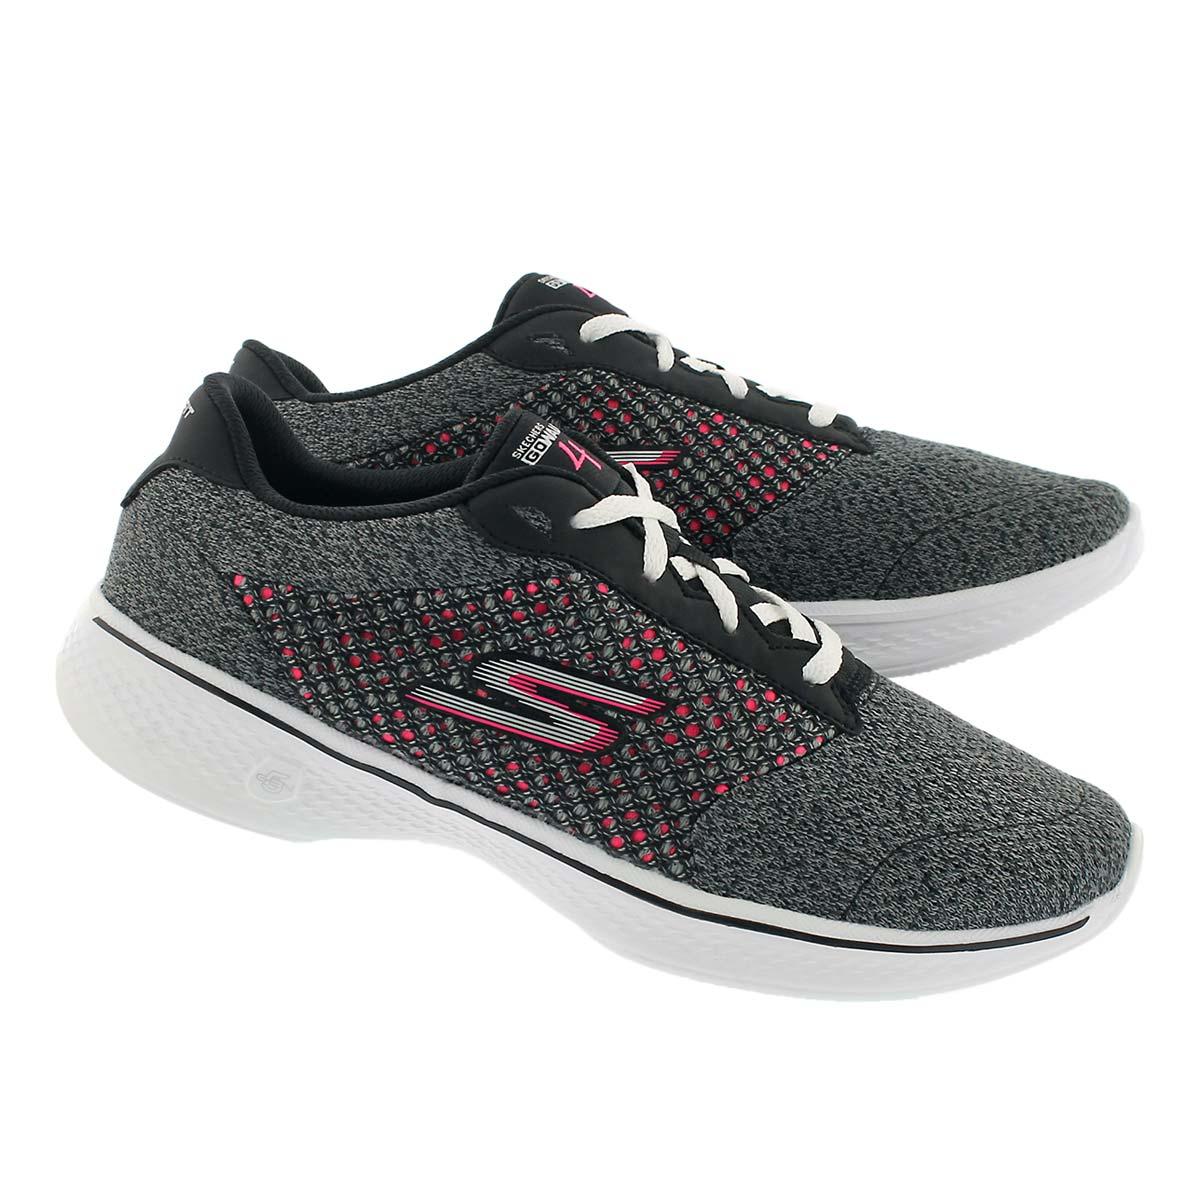 Lds GO Walk 4 Exceed bk/pk lace up shoe